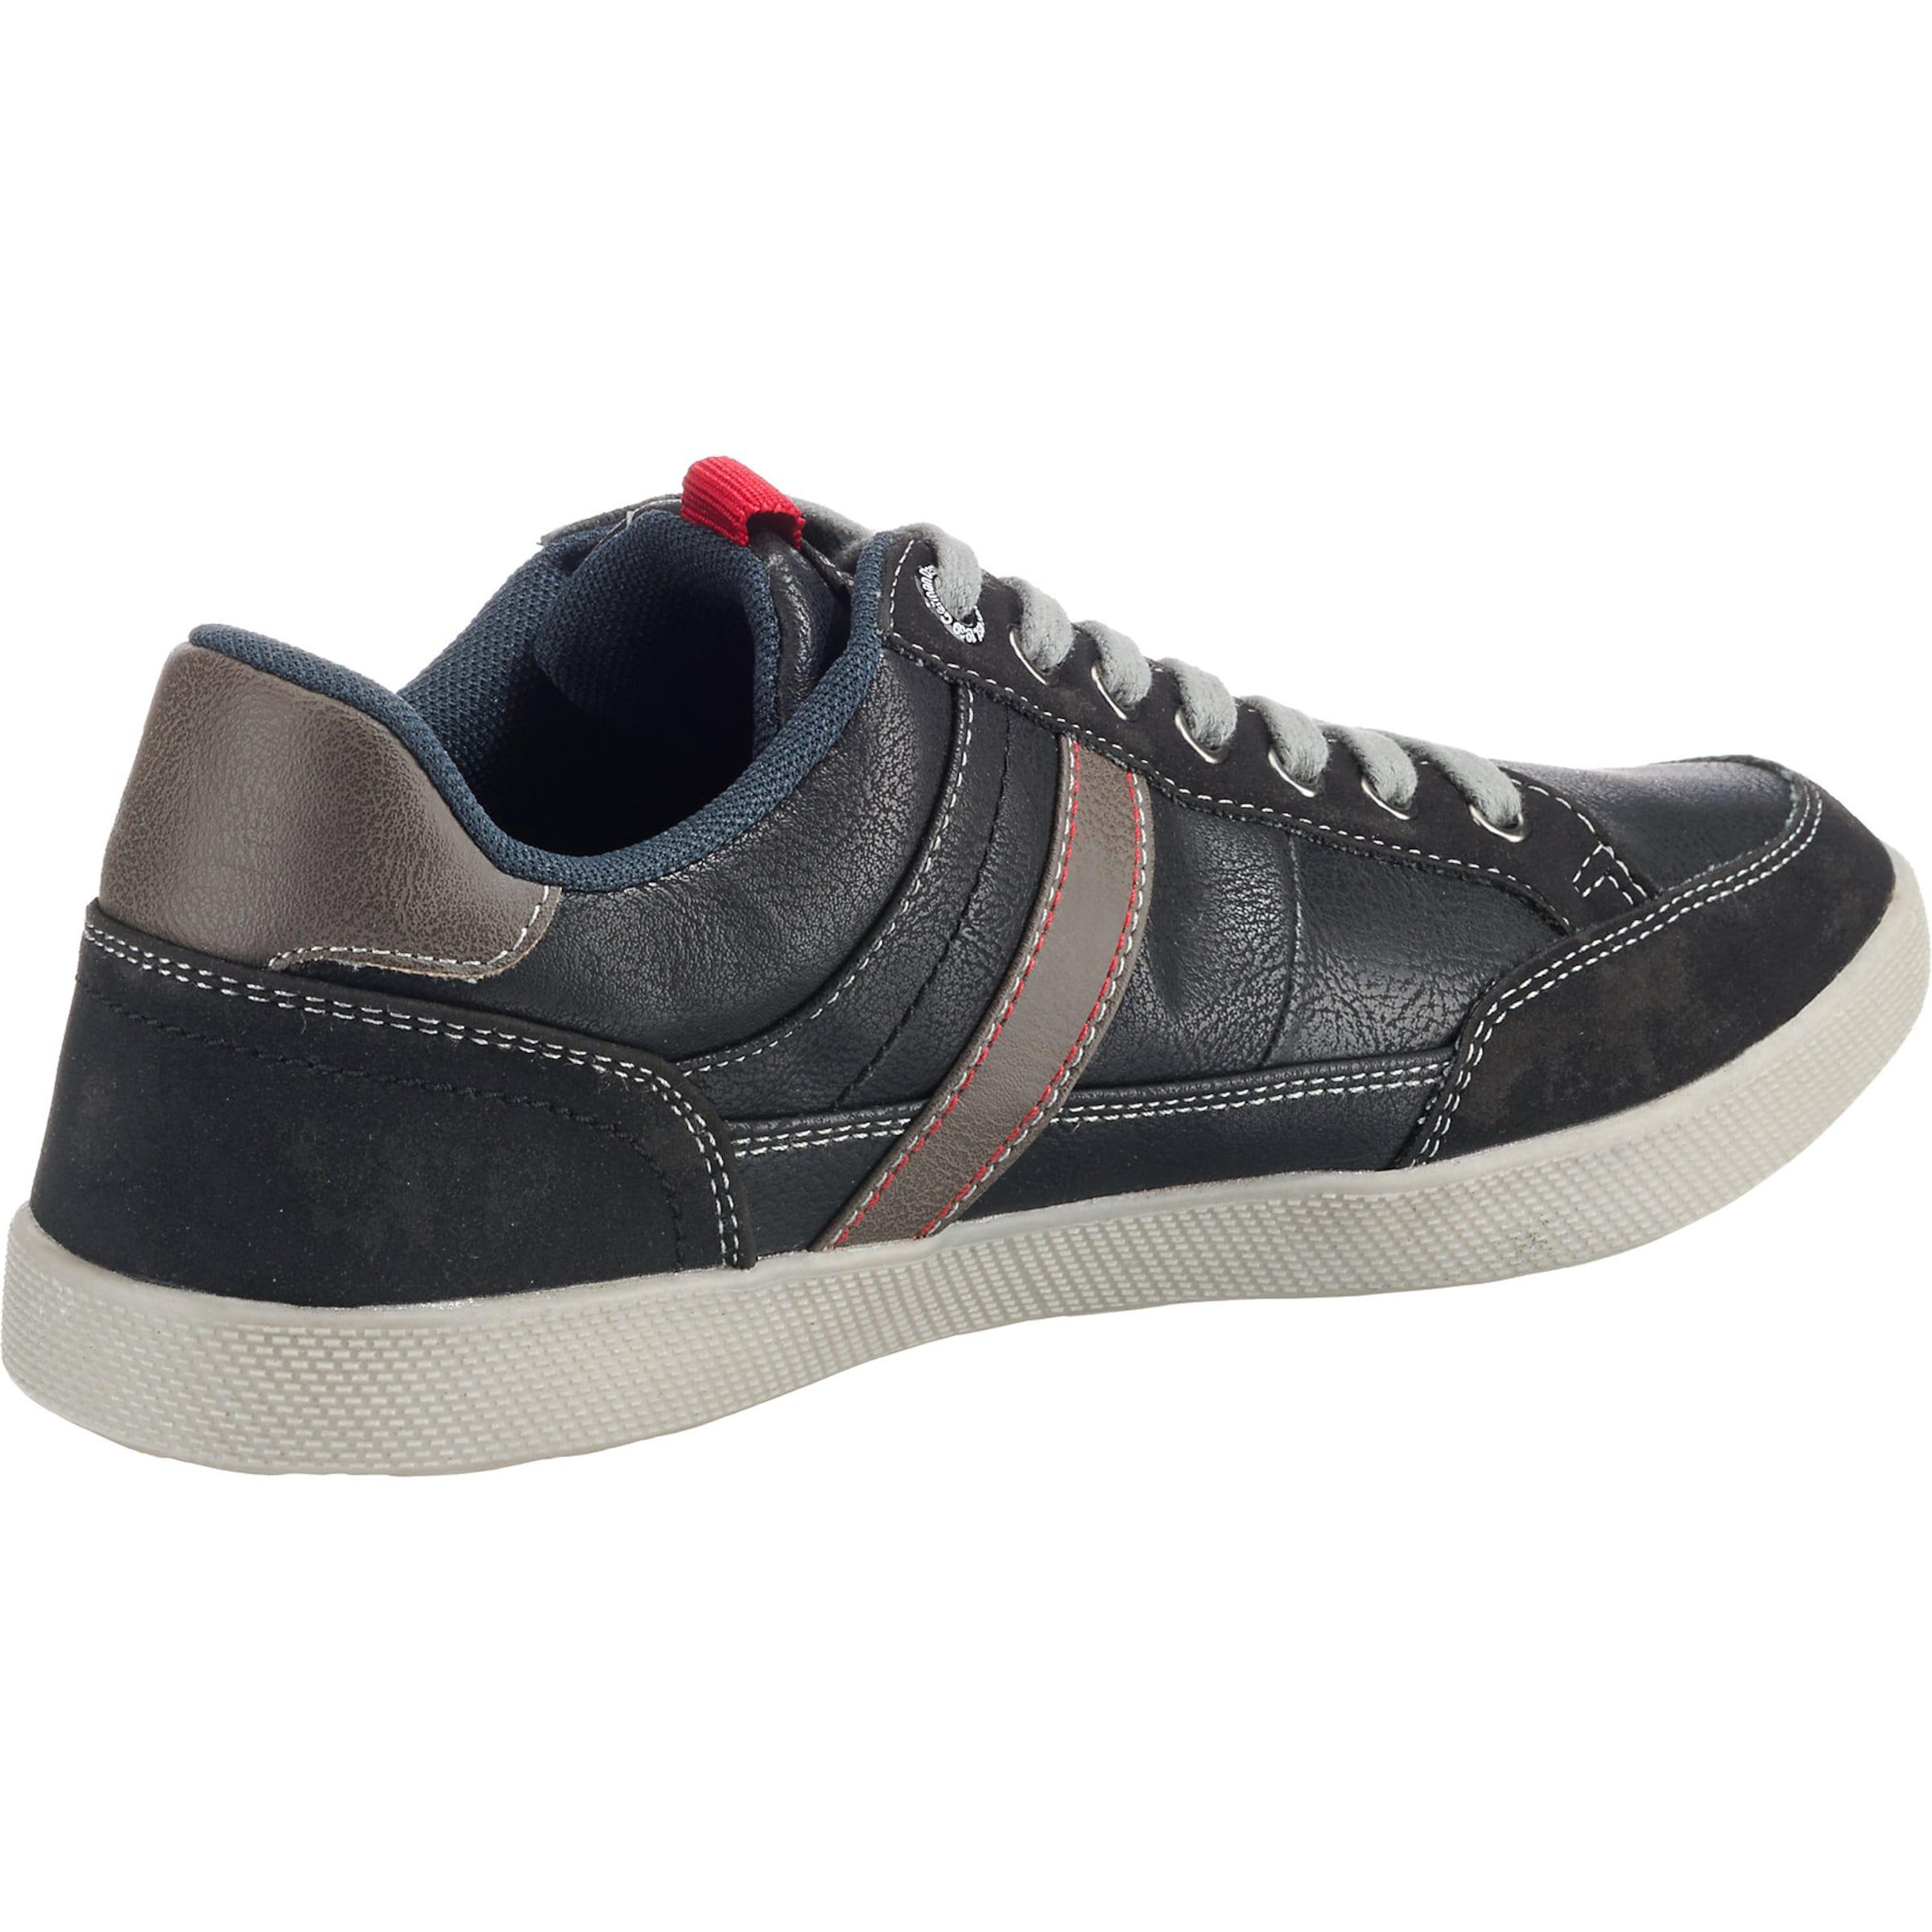 Red Sneaker oliver Label Schwarz S In zMVSUqp